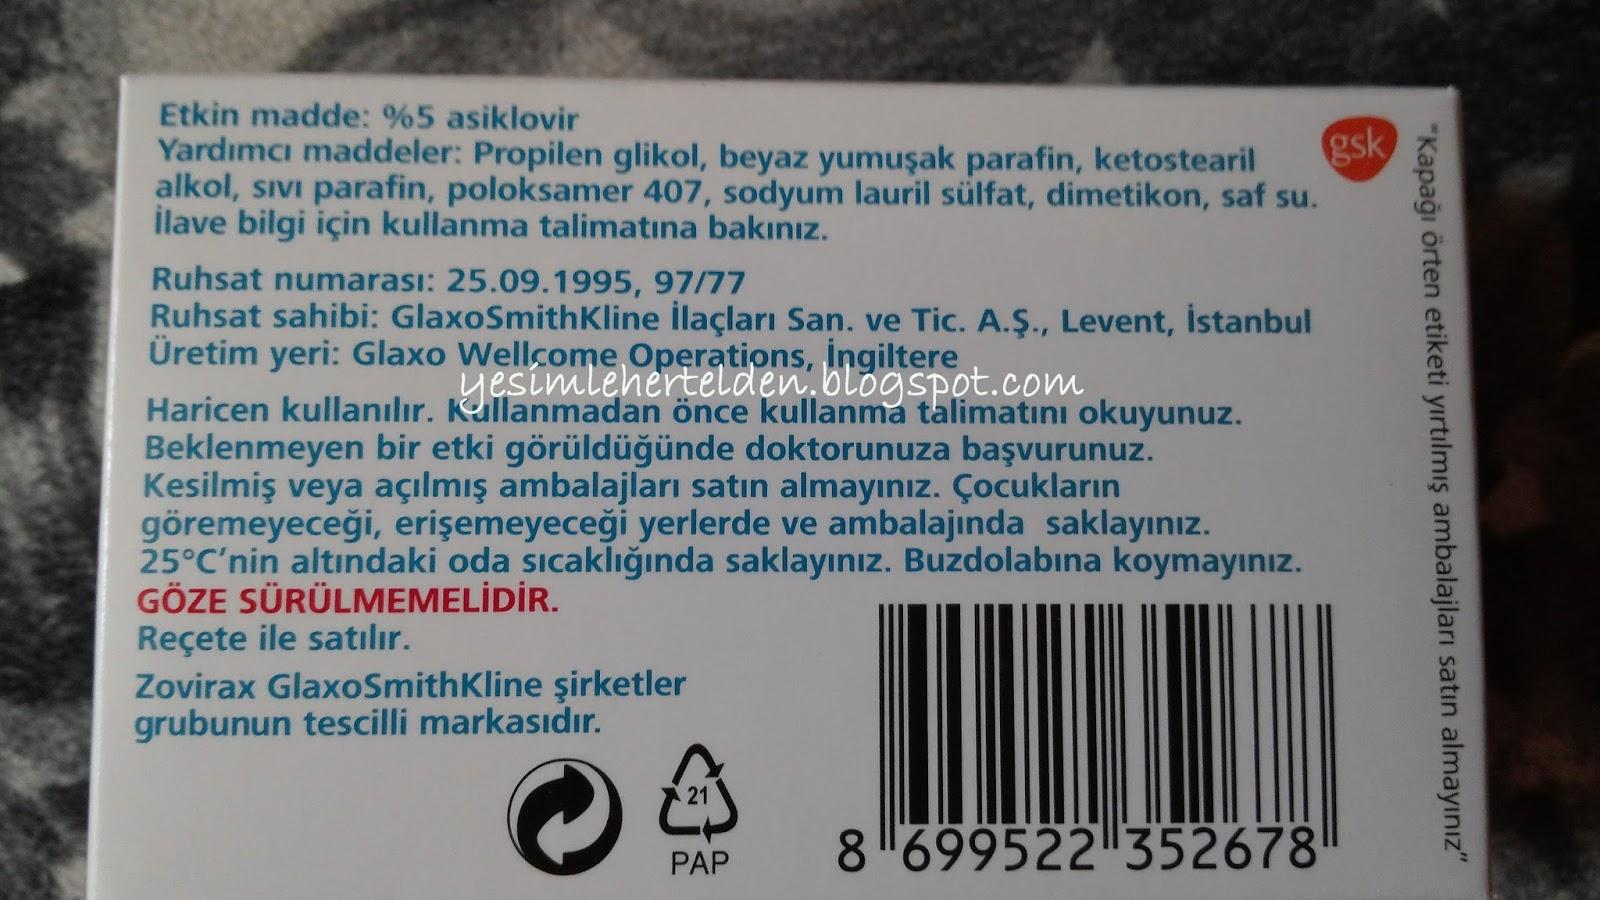 Asiklovir - herpese karşı merhem